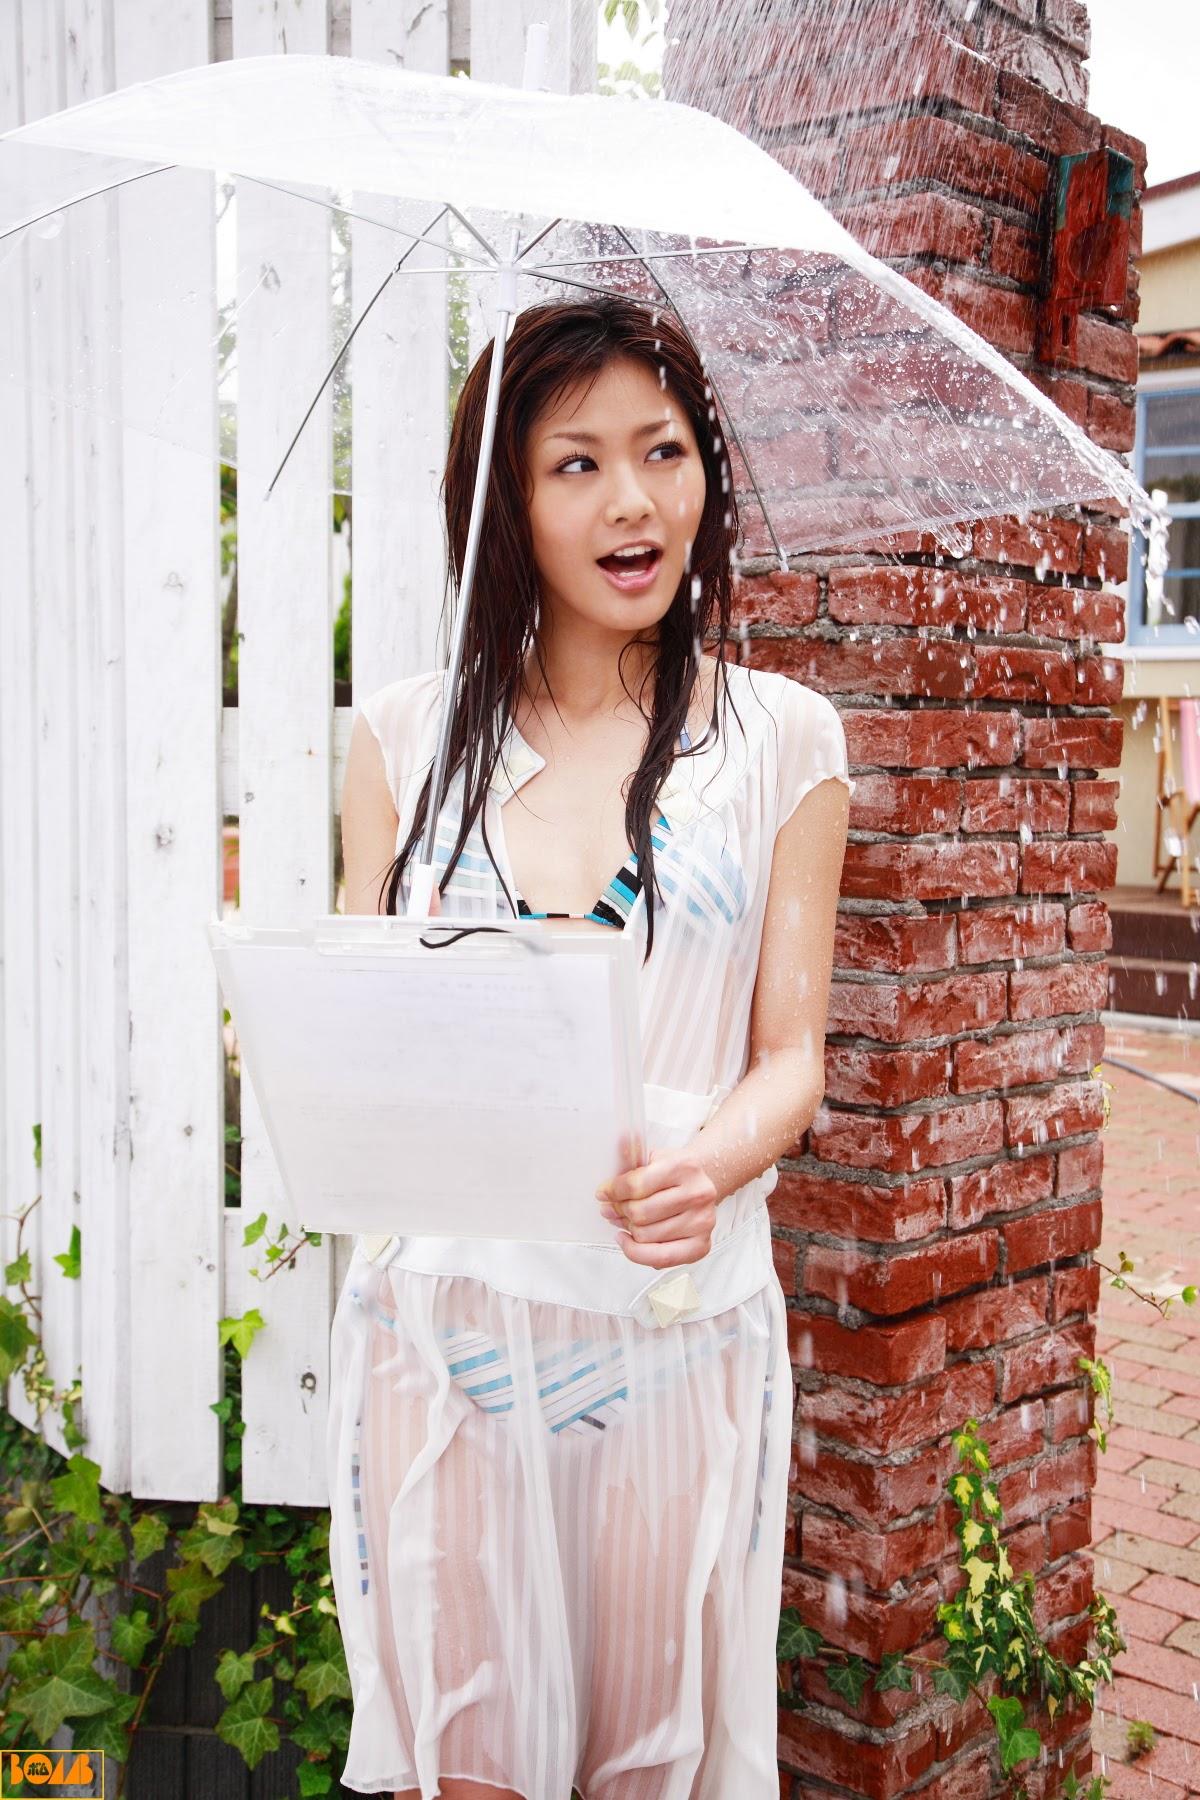 New era gravure harbor contact wet transparent sheer weather sister Rika Sato015